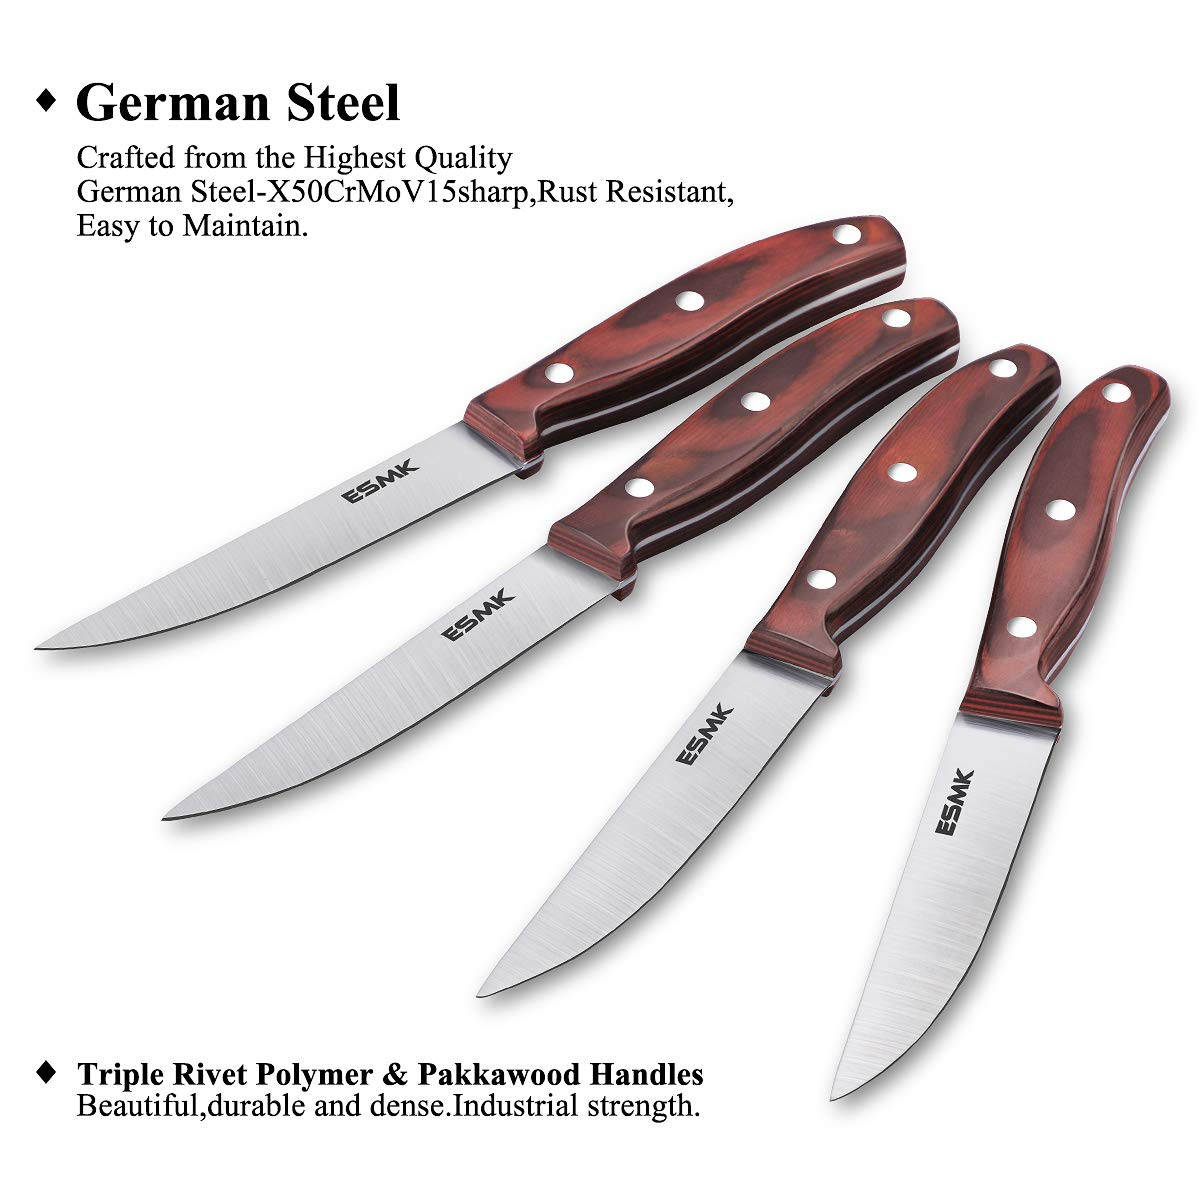 Knife Set, 15-Piece Kitchen Knife Set with Block Wooden, Manual Sharpening for Chef Knife Block Set, German Stainless Steel, ESMK (15 PCs Knife Block Set) by ESMK (Image #6)